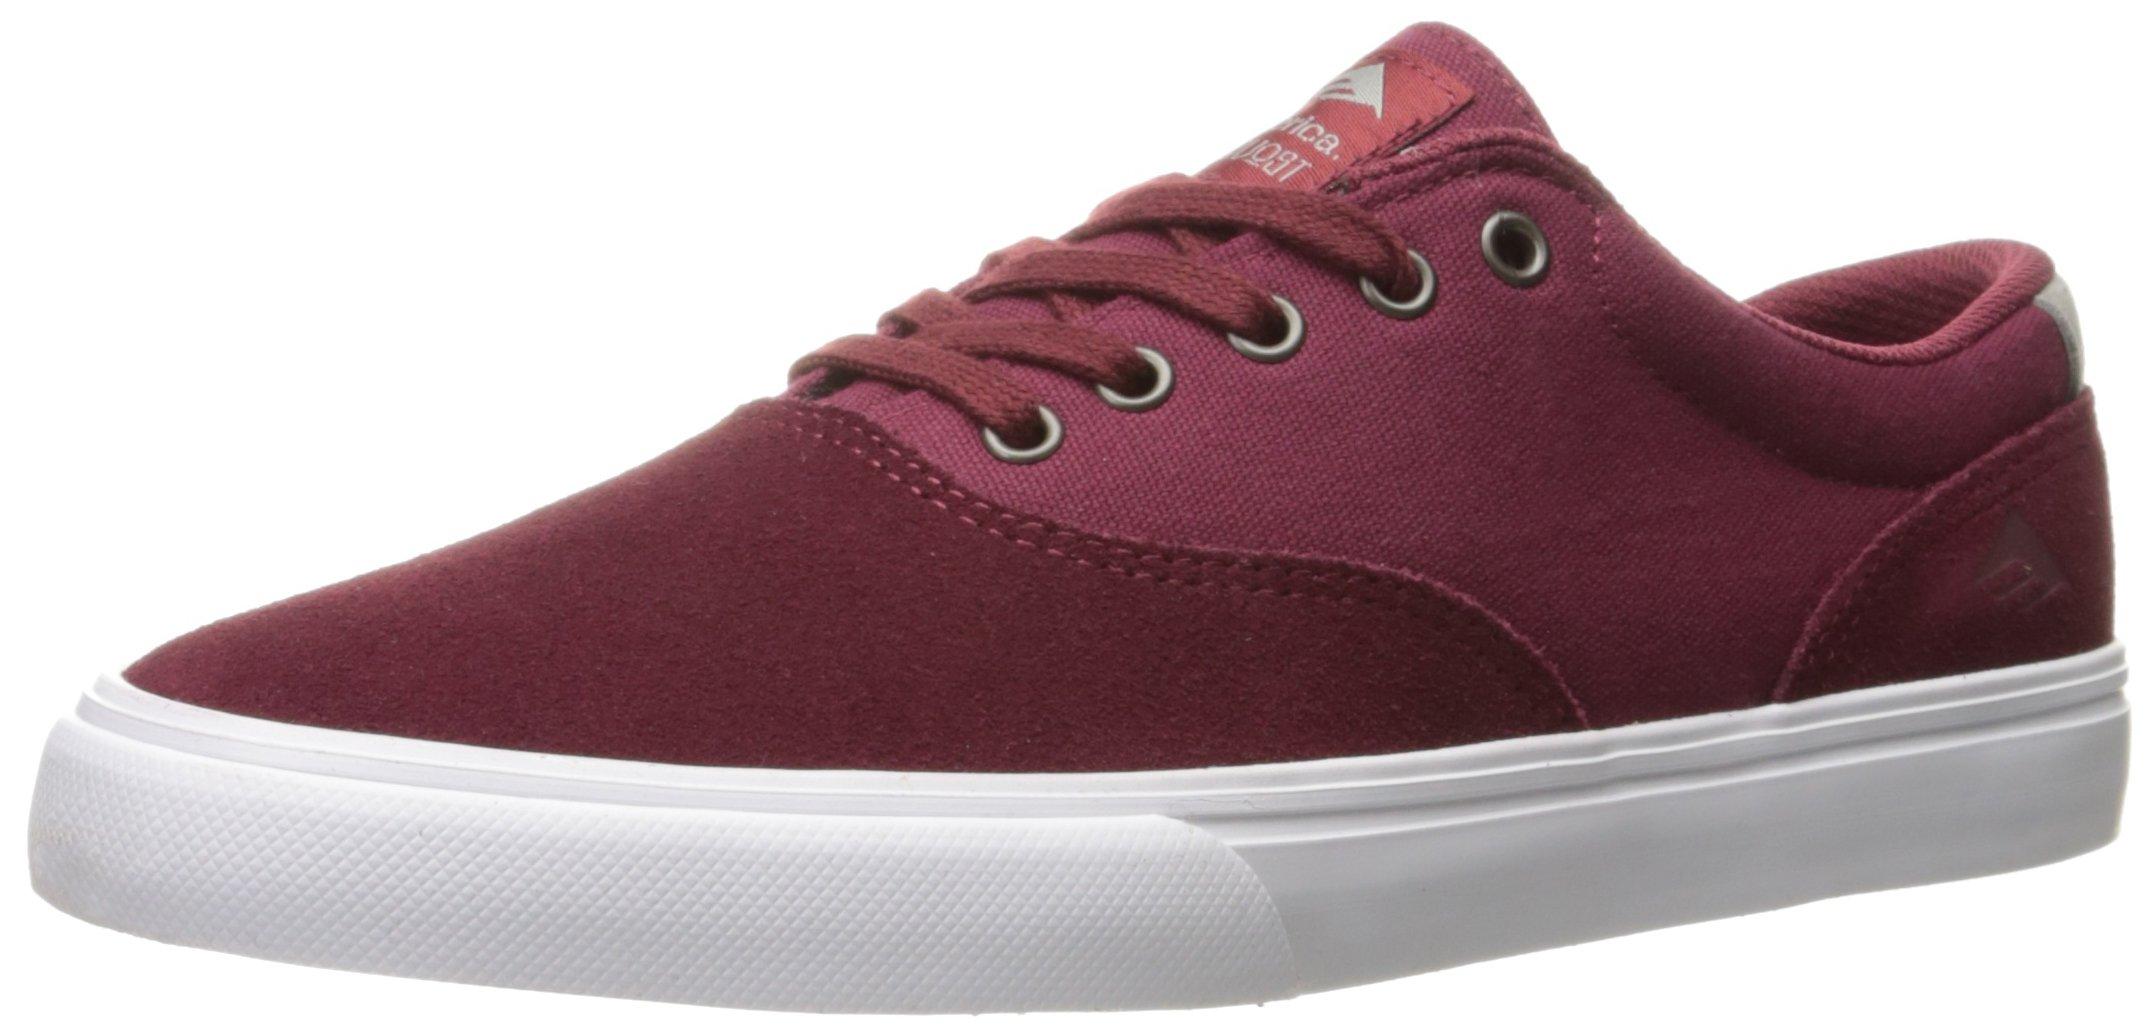 Emerica Provost Slim Vulc Skate Shoe,Burgundy,10.5